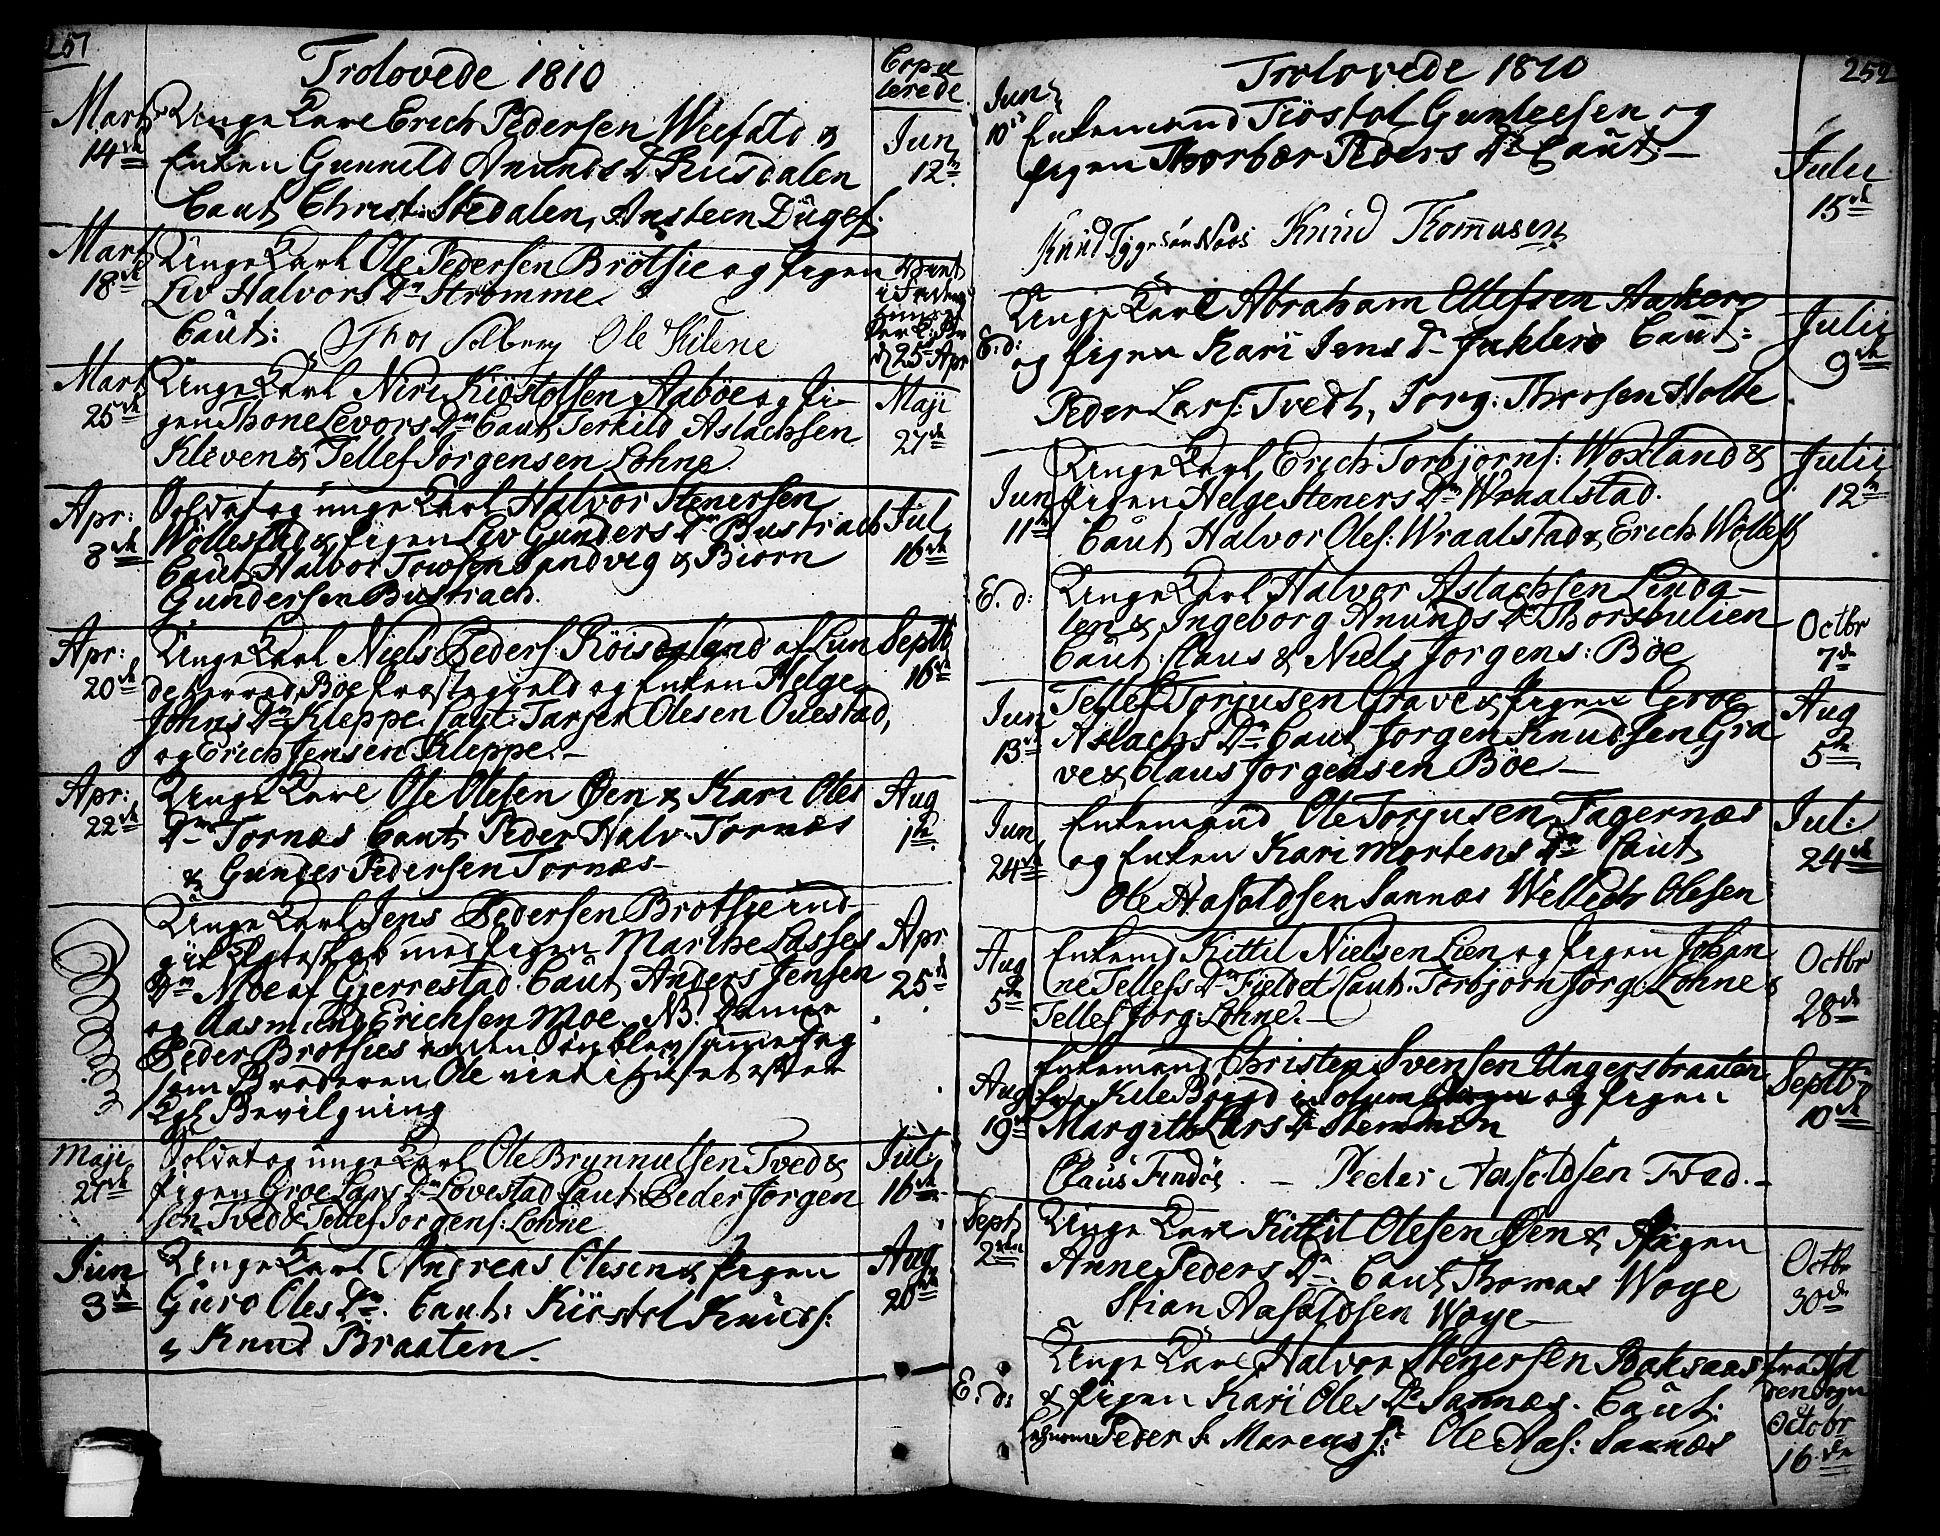 SAKO, Drangedal kirkebøker, F/Fa/L0003: Ministerialbok nr. 3, 1768-1814, s. 251-252